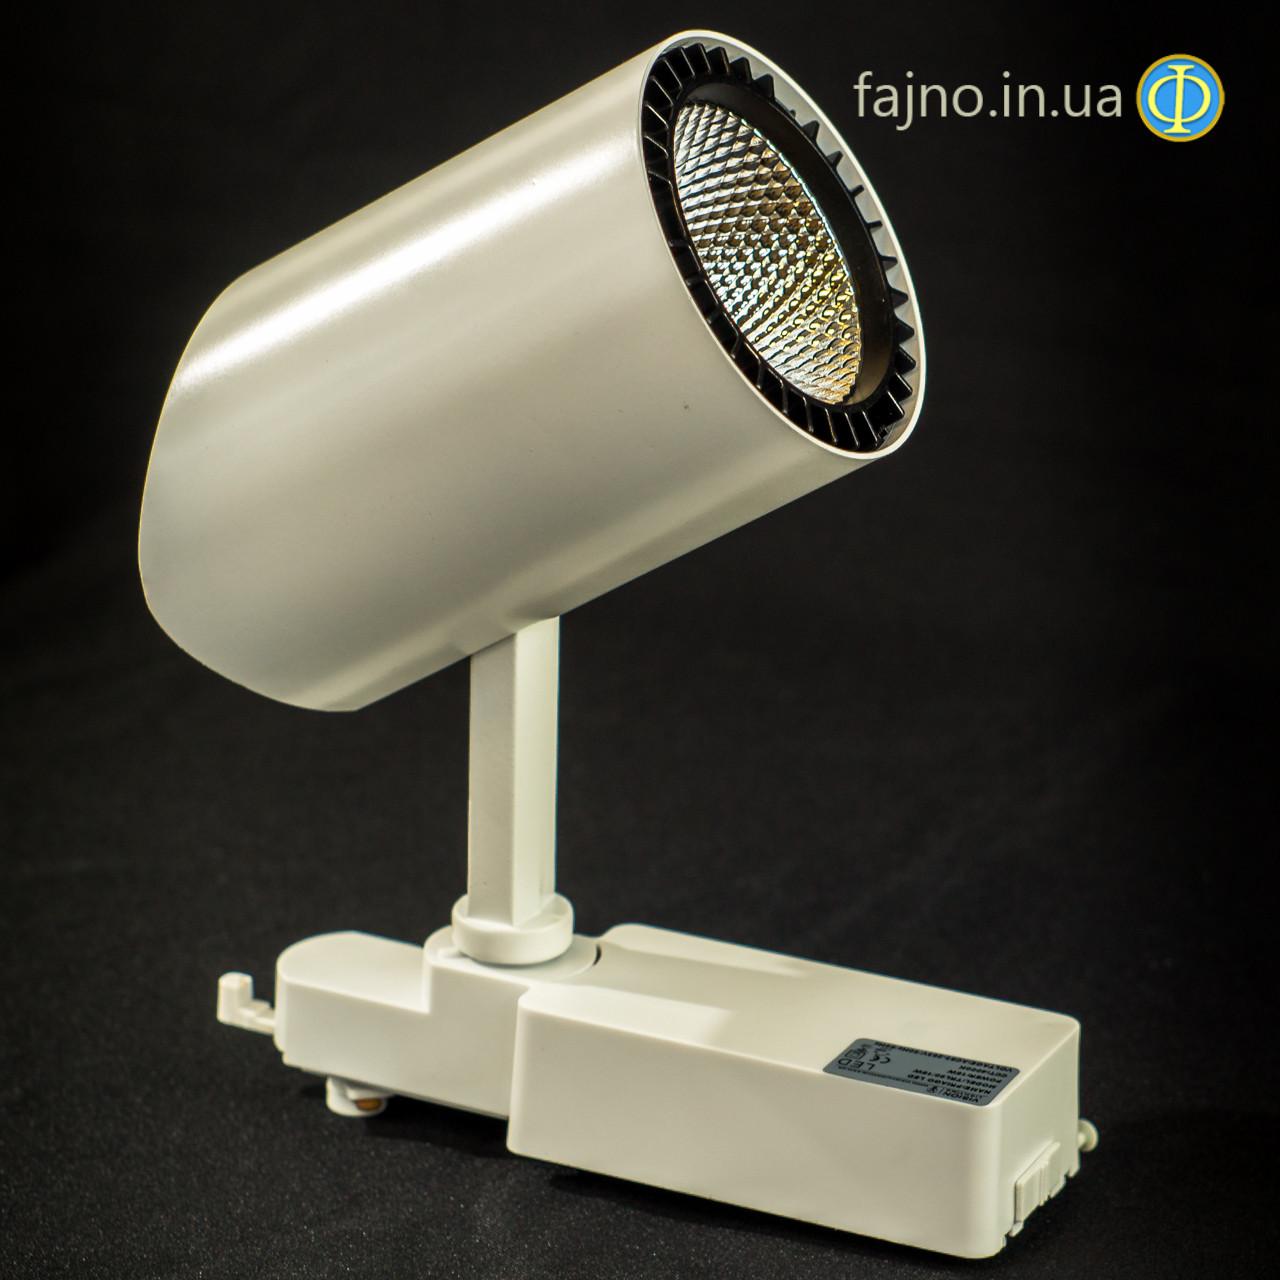 Додати фото, переробити текст та хар-ки Прожектор на шинопровод VISION ECOLED TRL-03030/30W LED